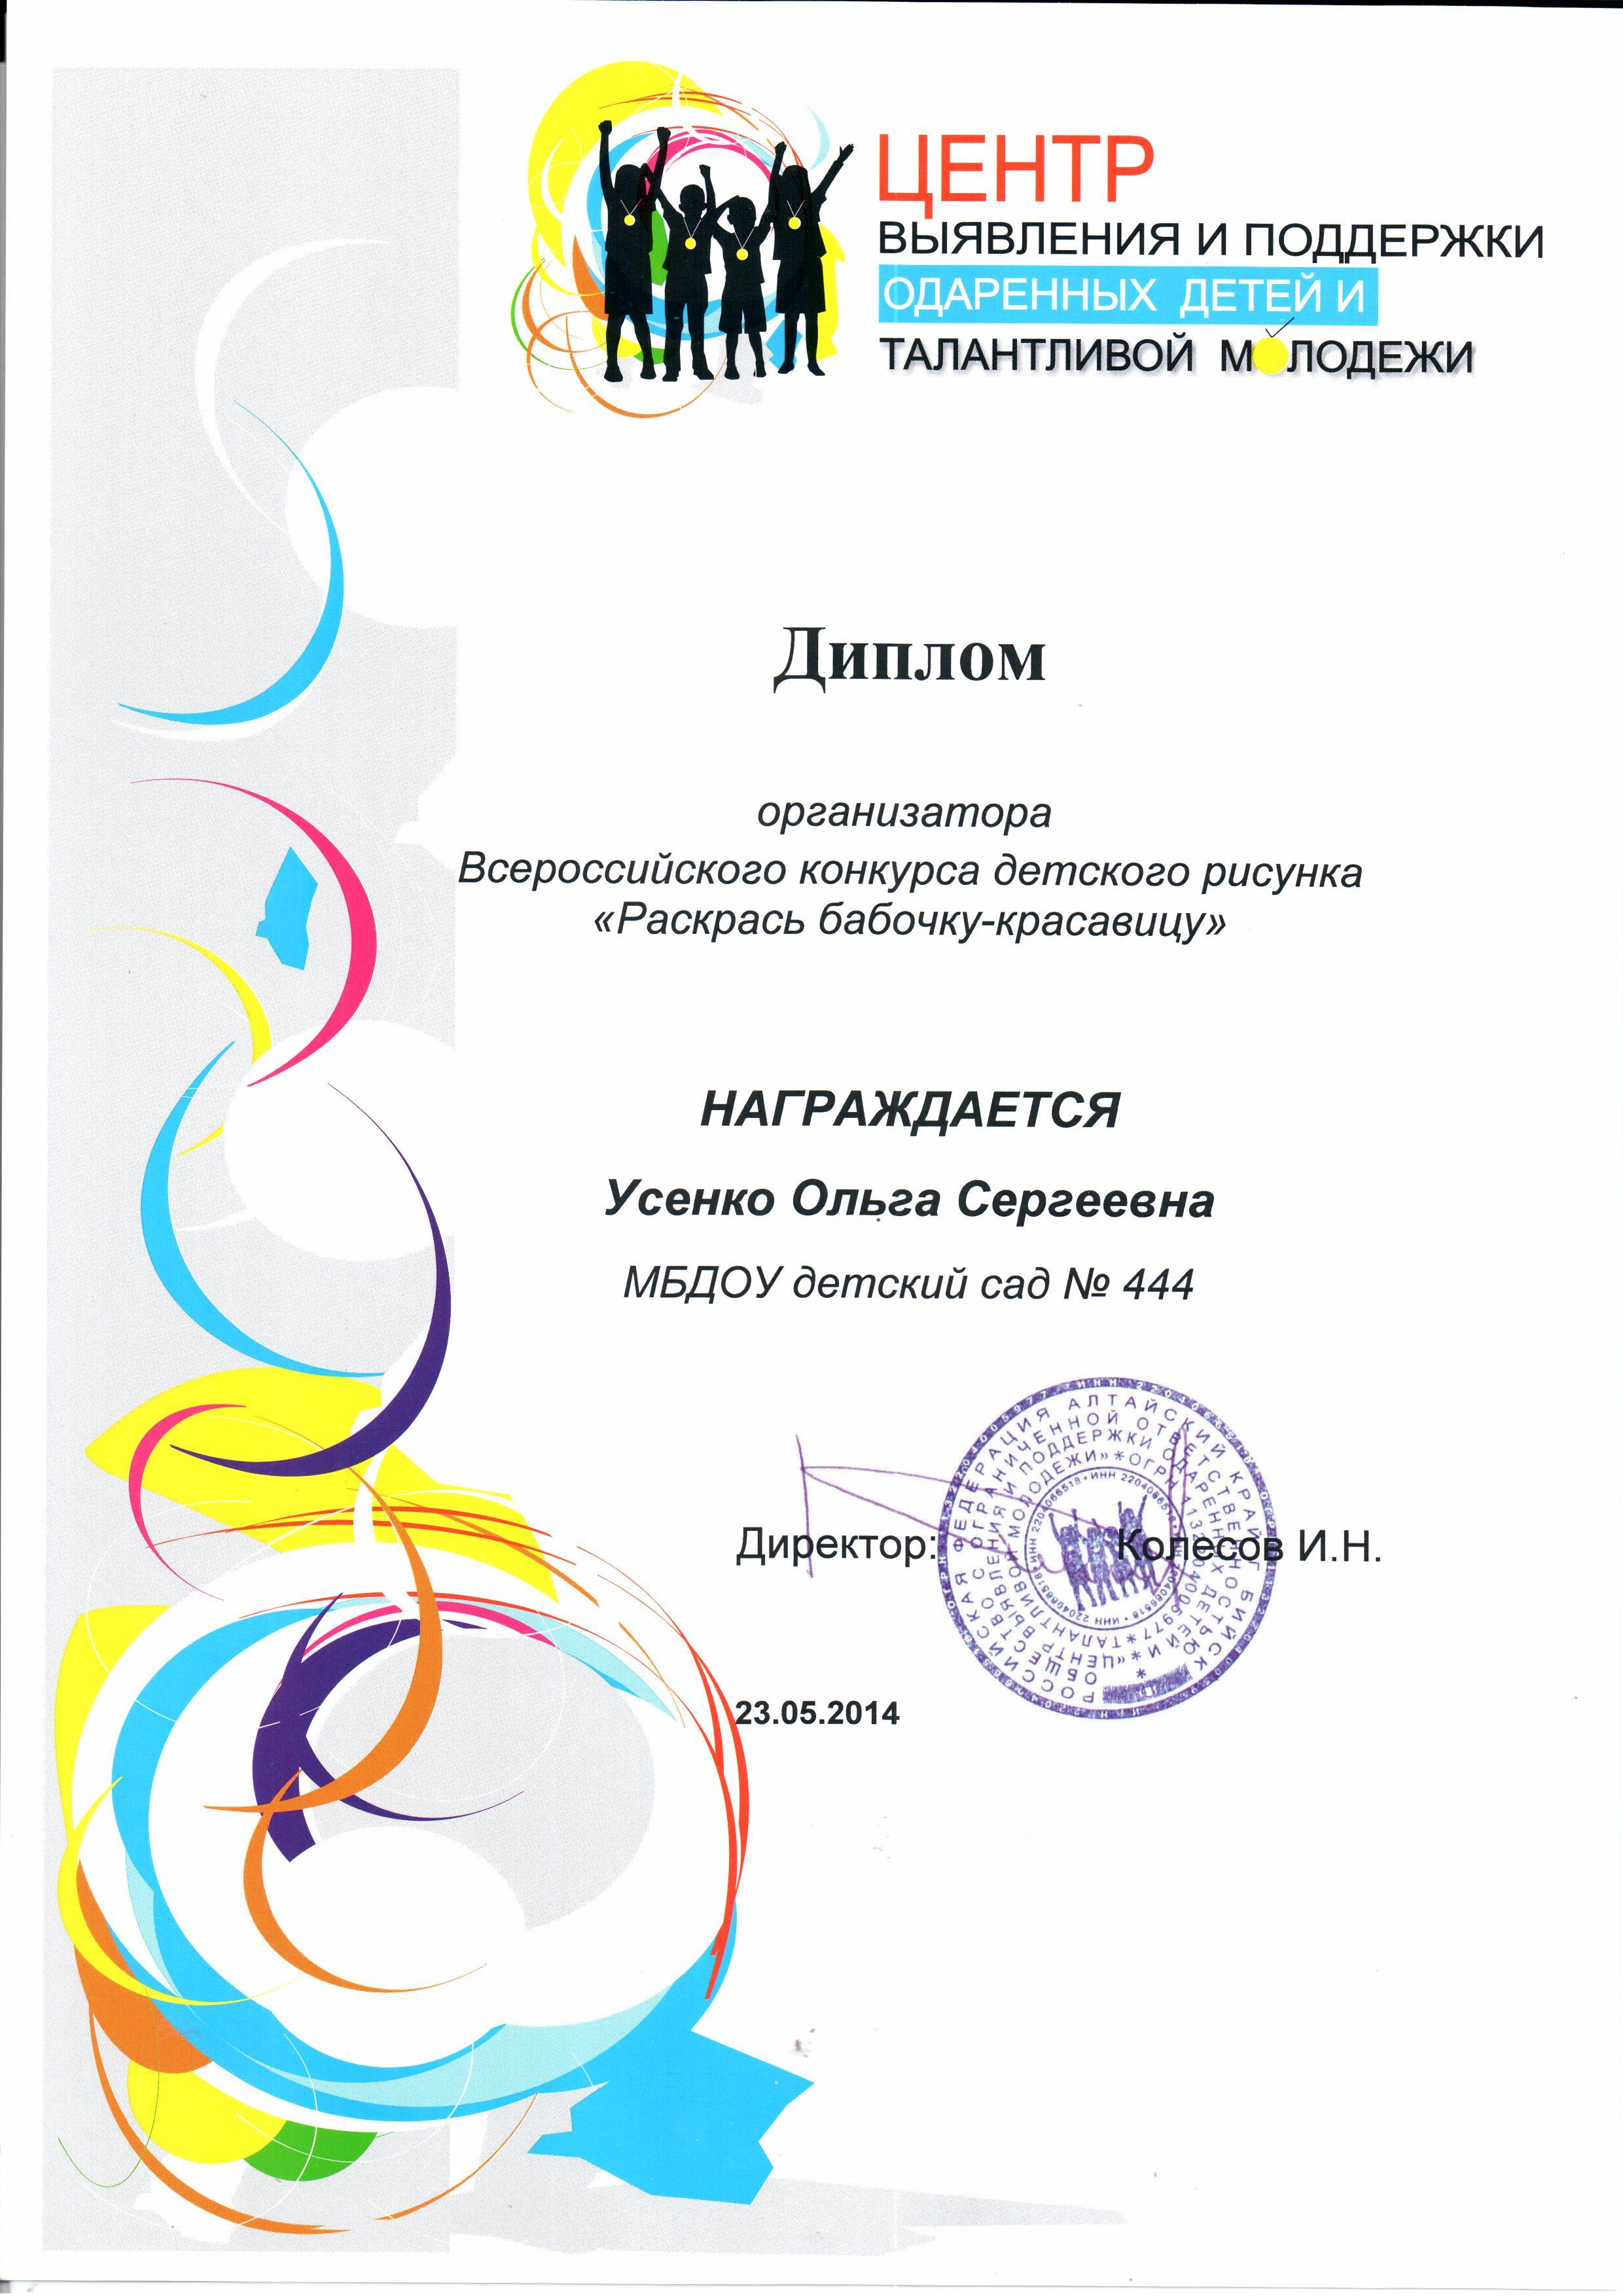 Всероссийский конкурс рисунков 2012 ...: pictures11.ru/vserossijskij-konkurs-risunkov-2012.html